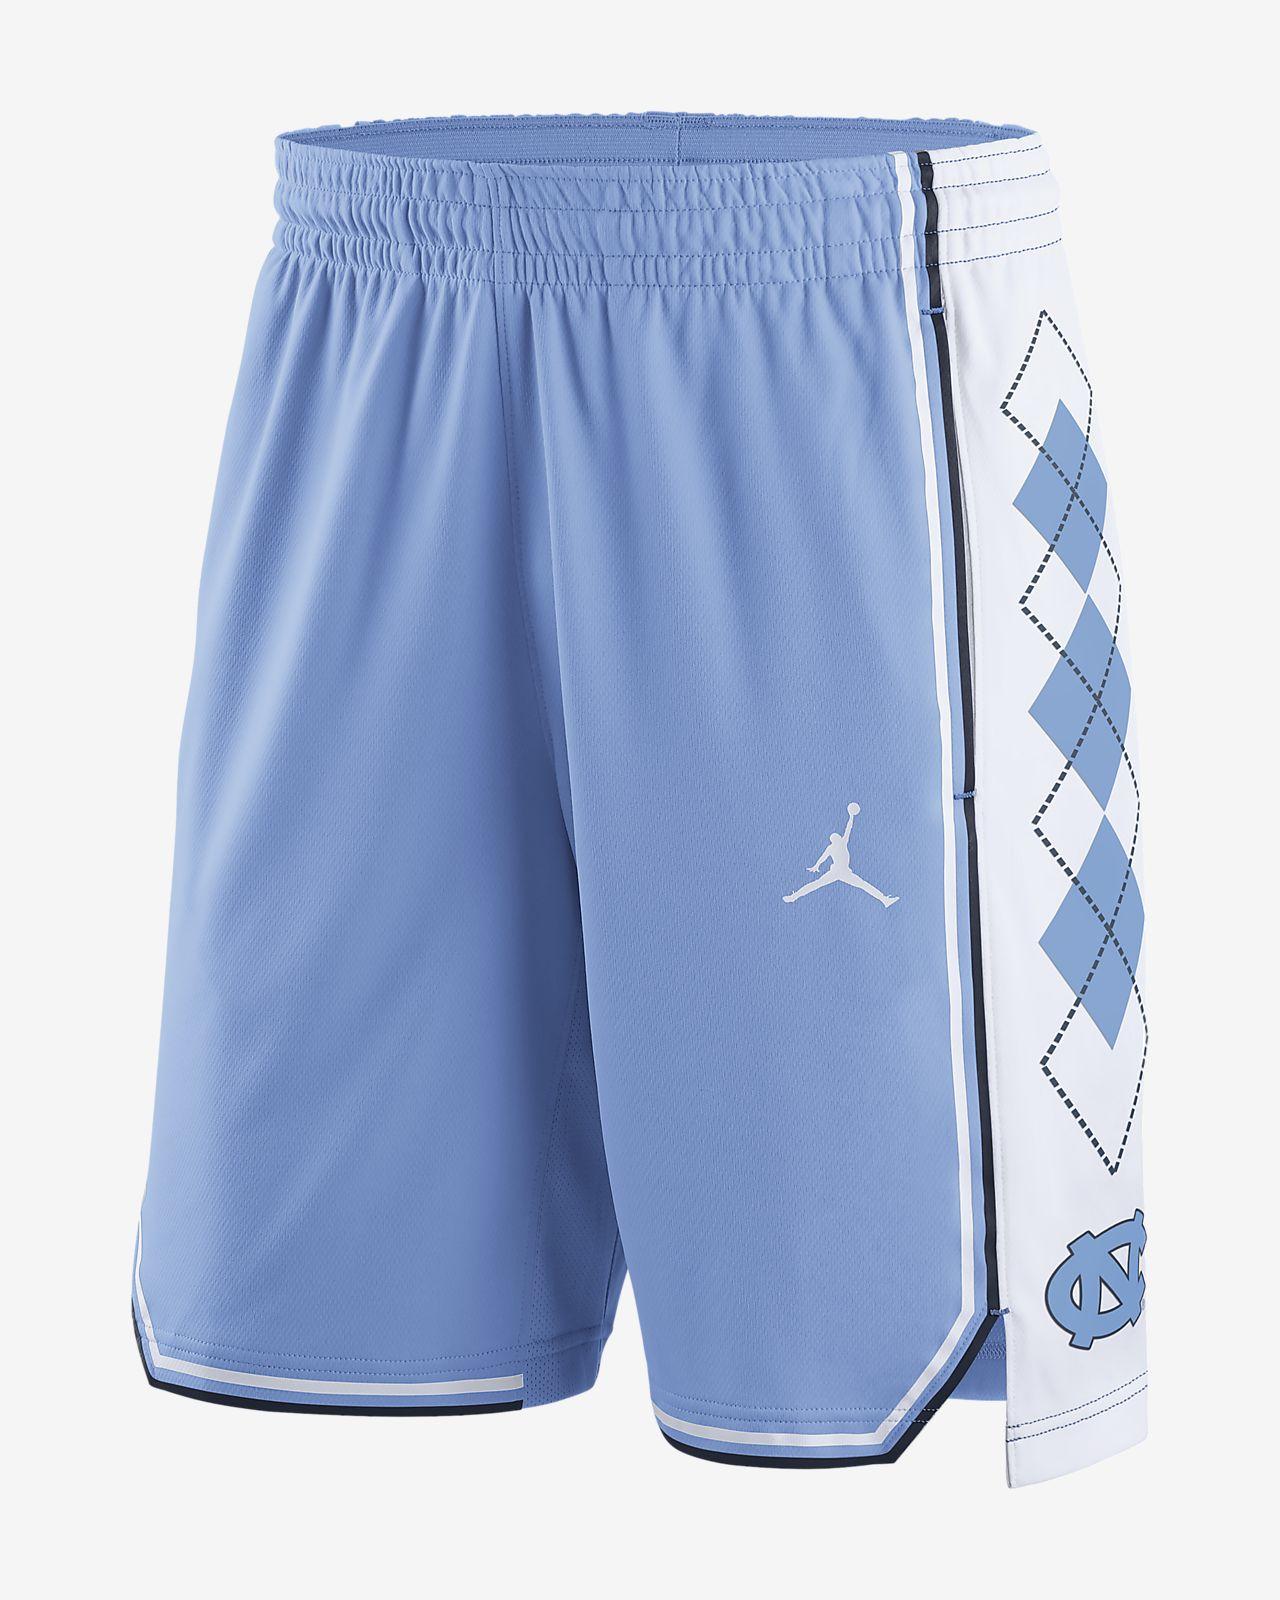 96b497ee6642ca Jordan College Replica (UNC) Men s Basketball Shorts. Nike.com